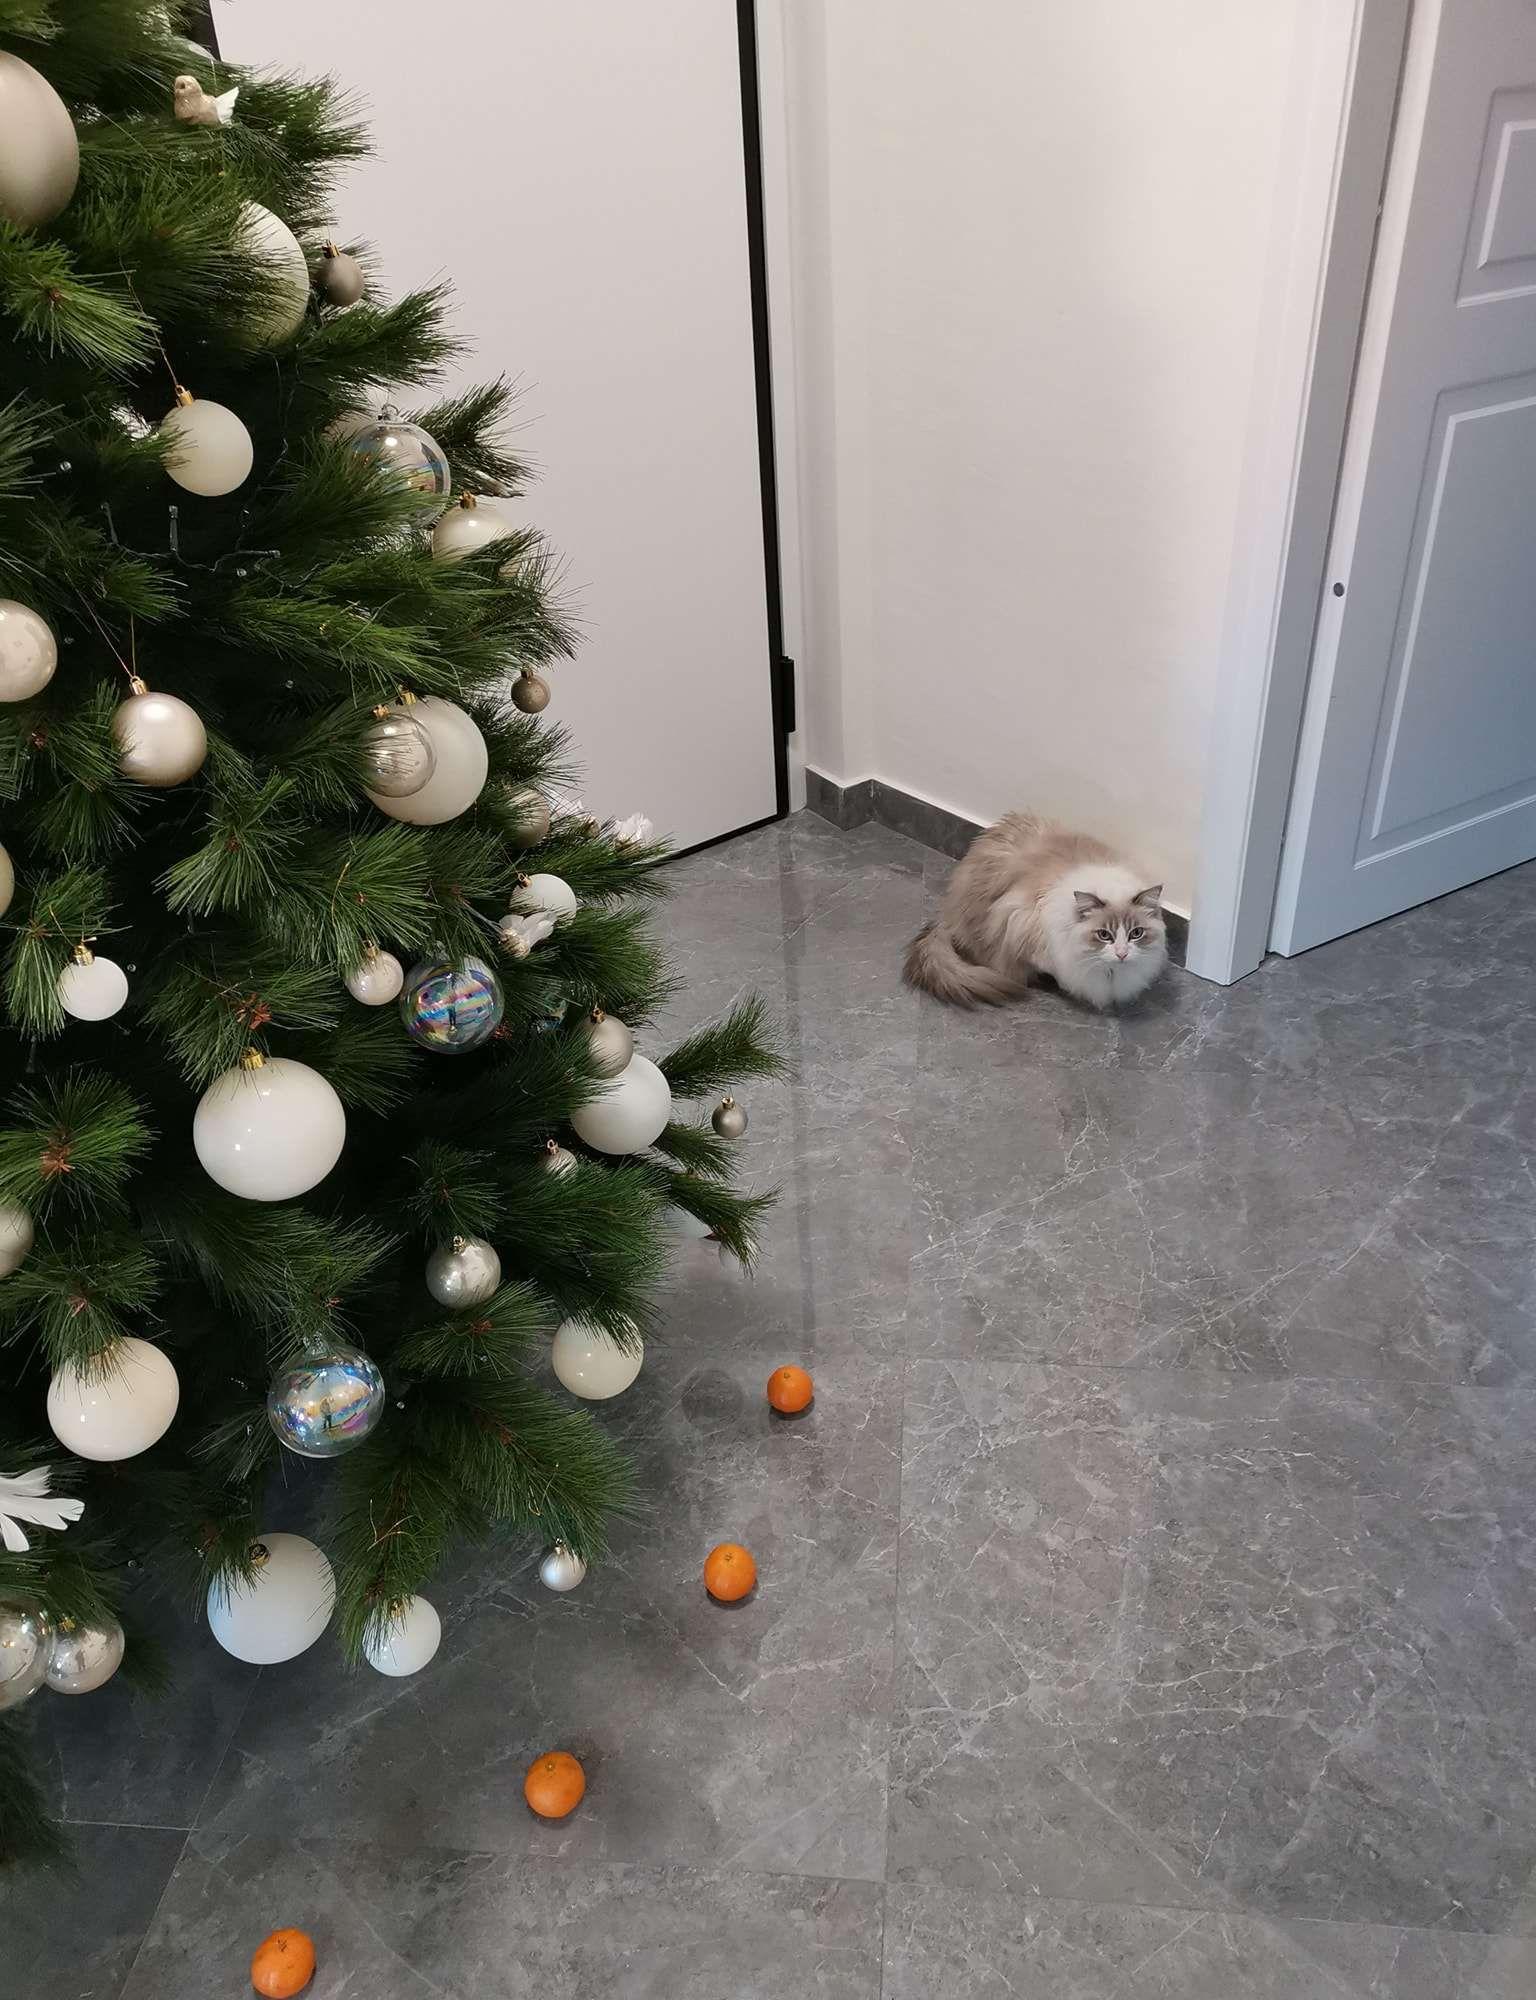 Cat Won't Destroy Christmas Tree Because Of Tangerine